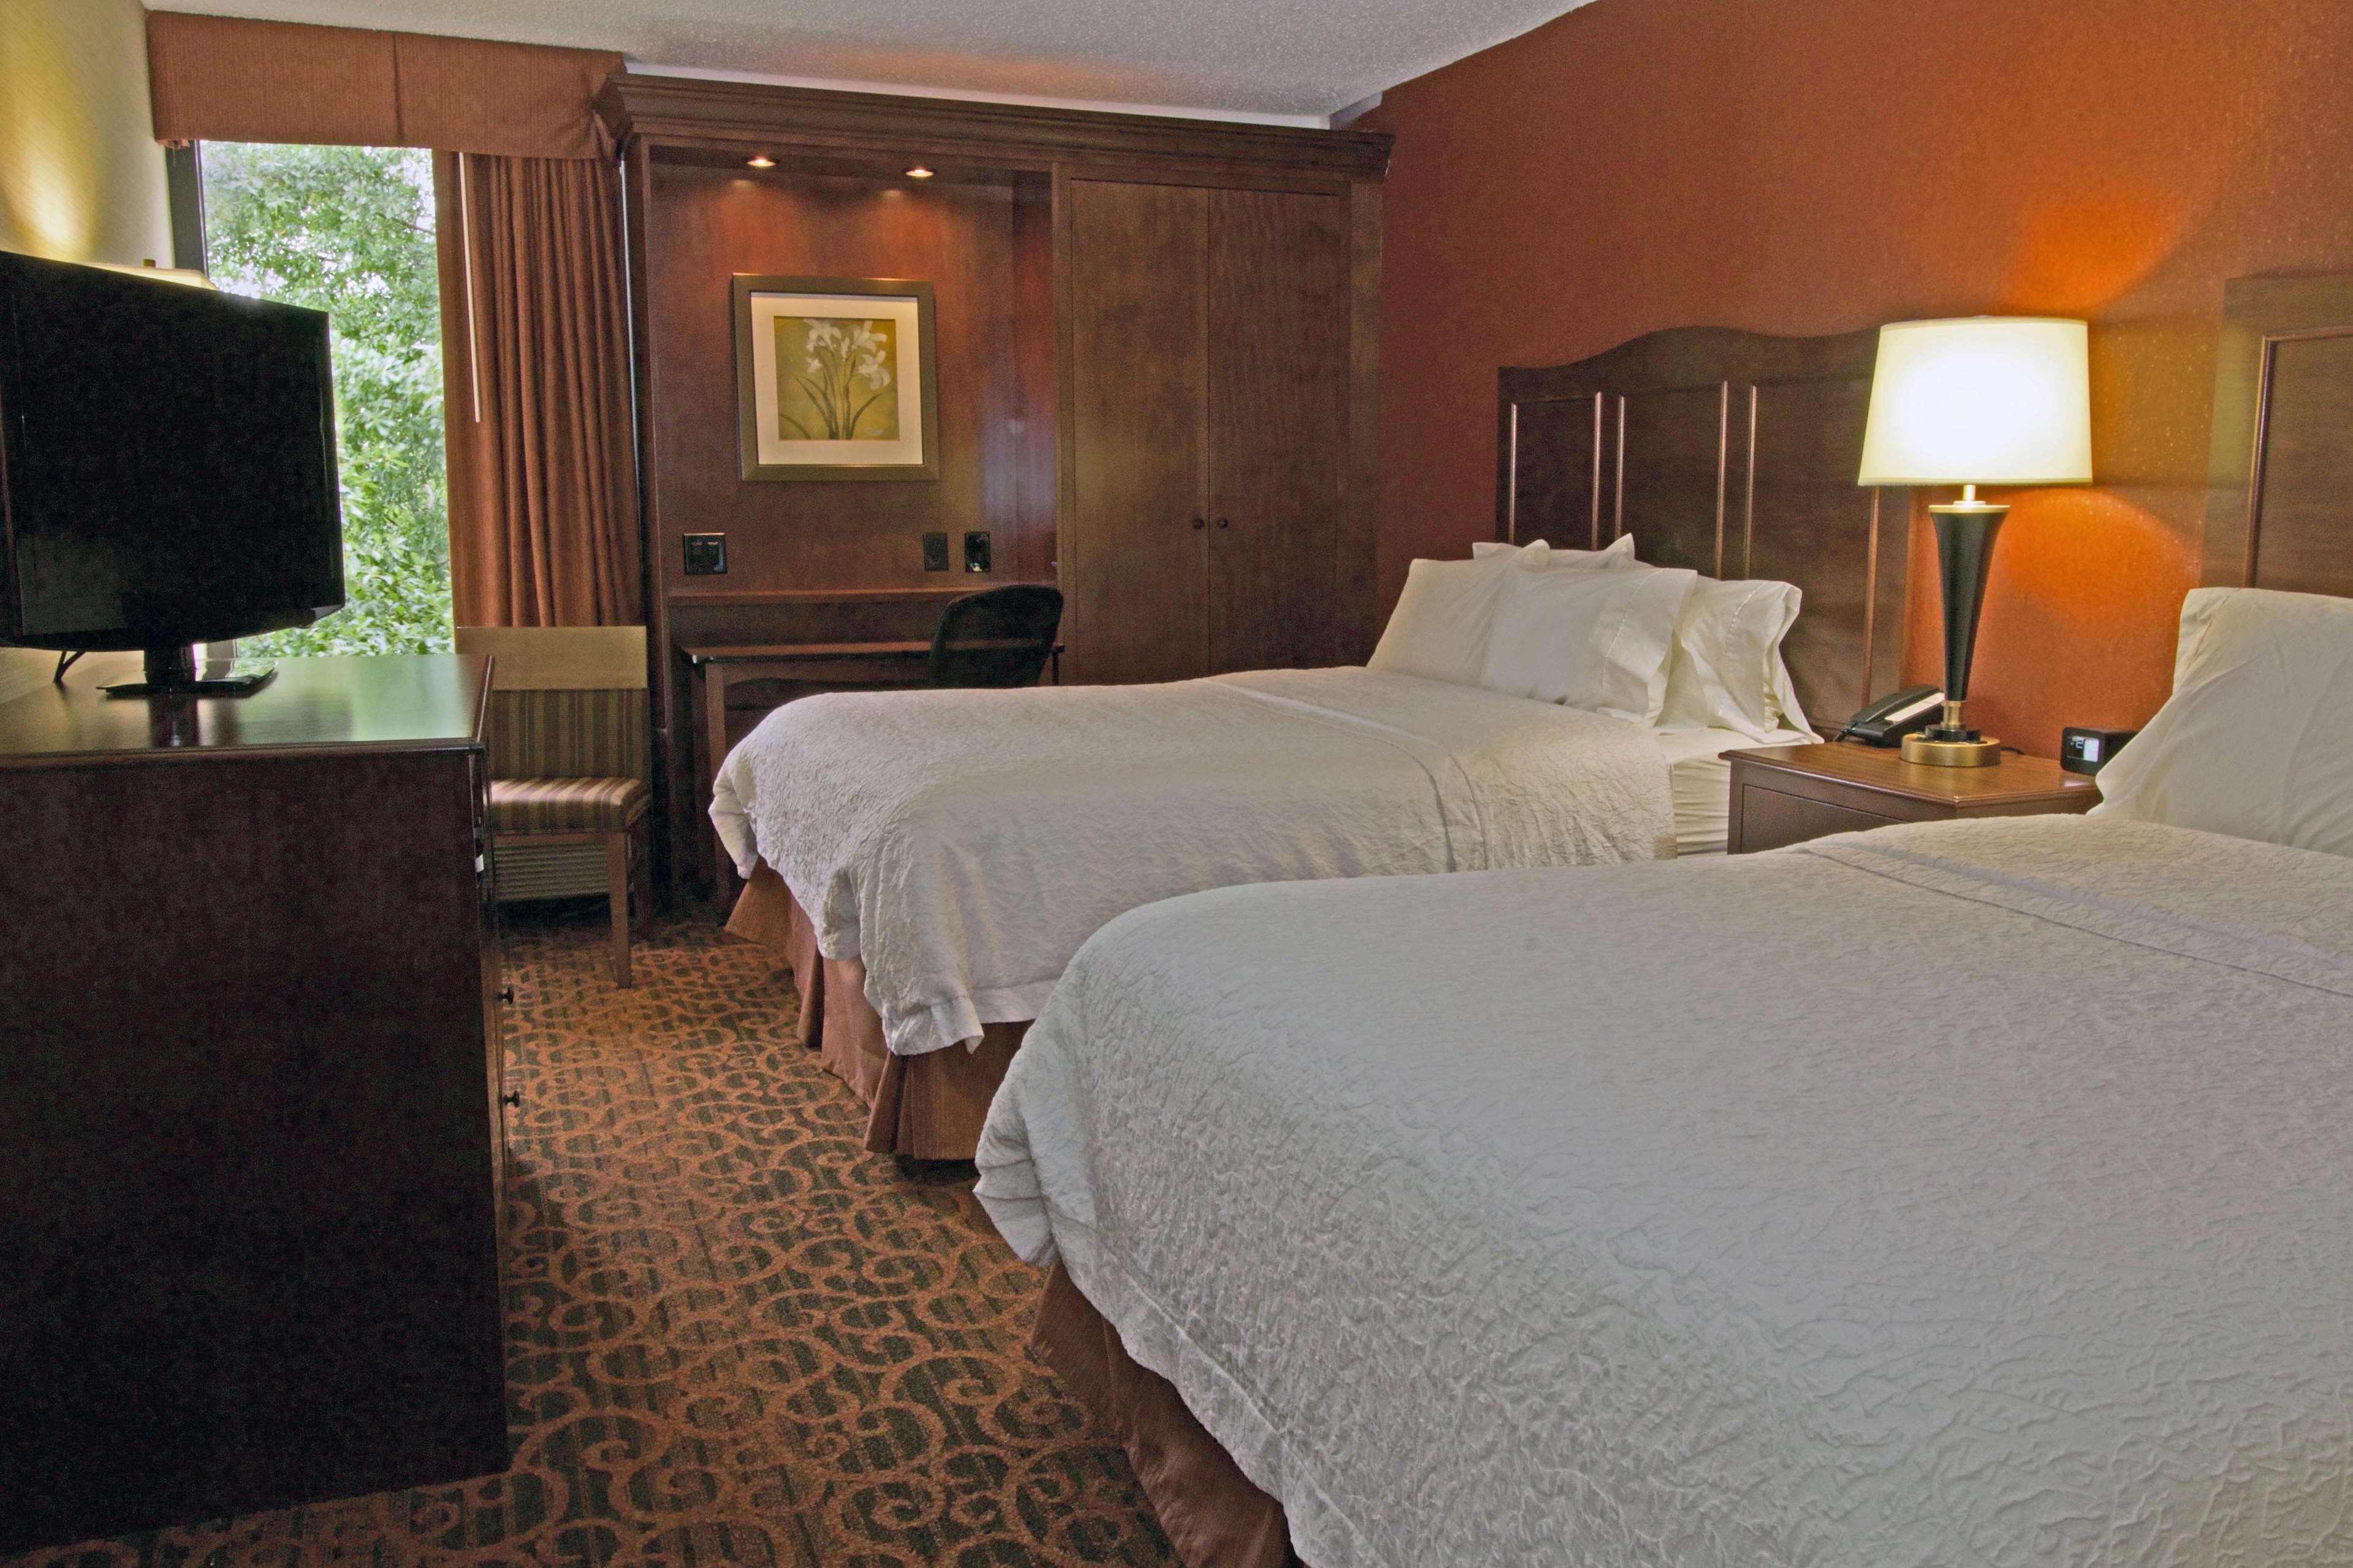 Hampton Inn Norfolk/Chesapeake (Greenbrier Area) image 21